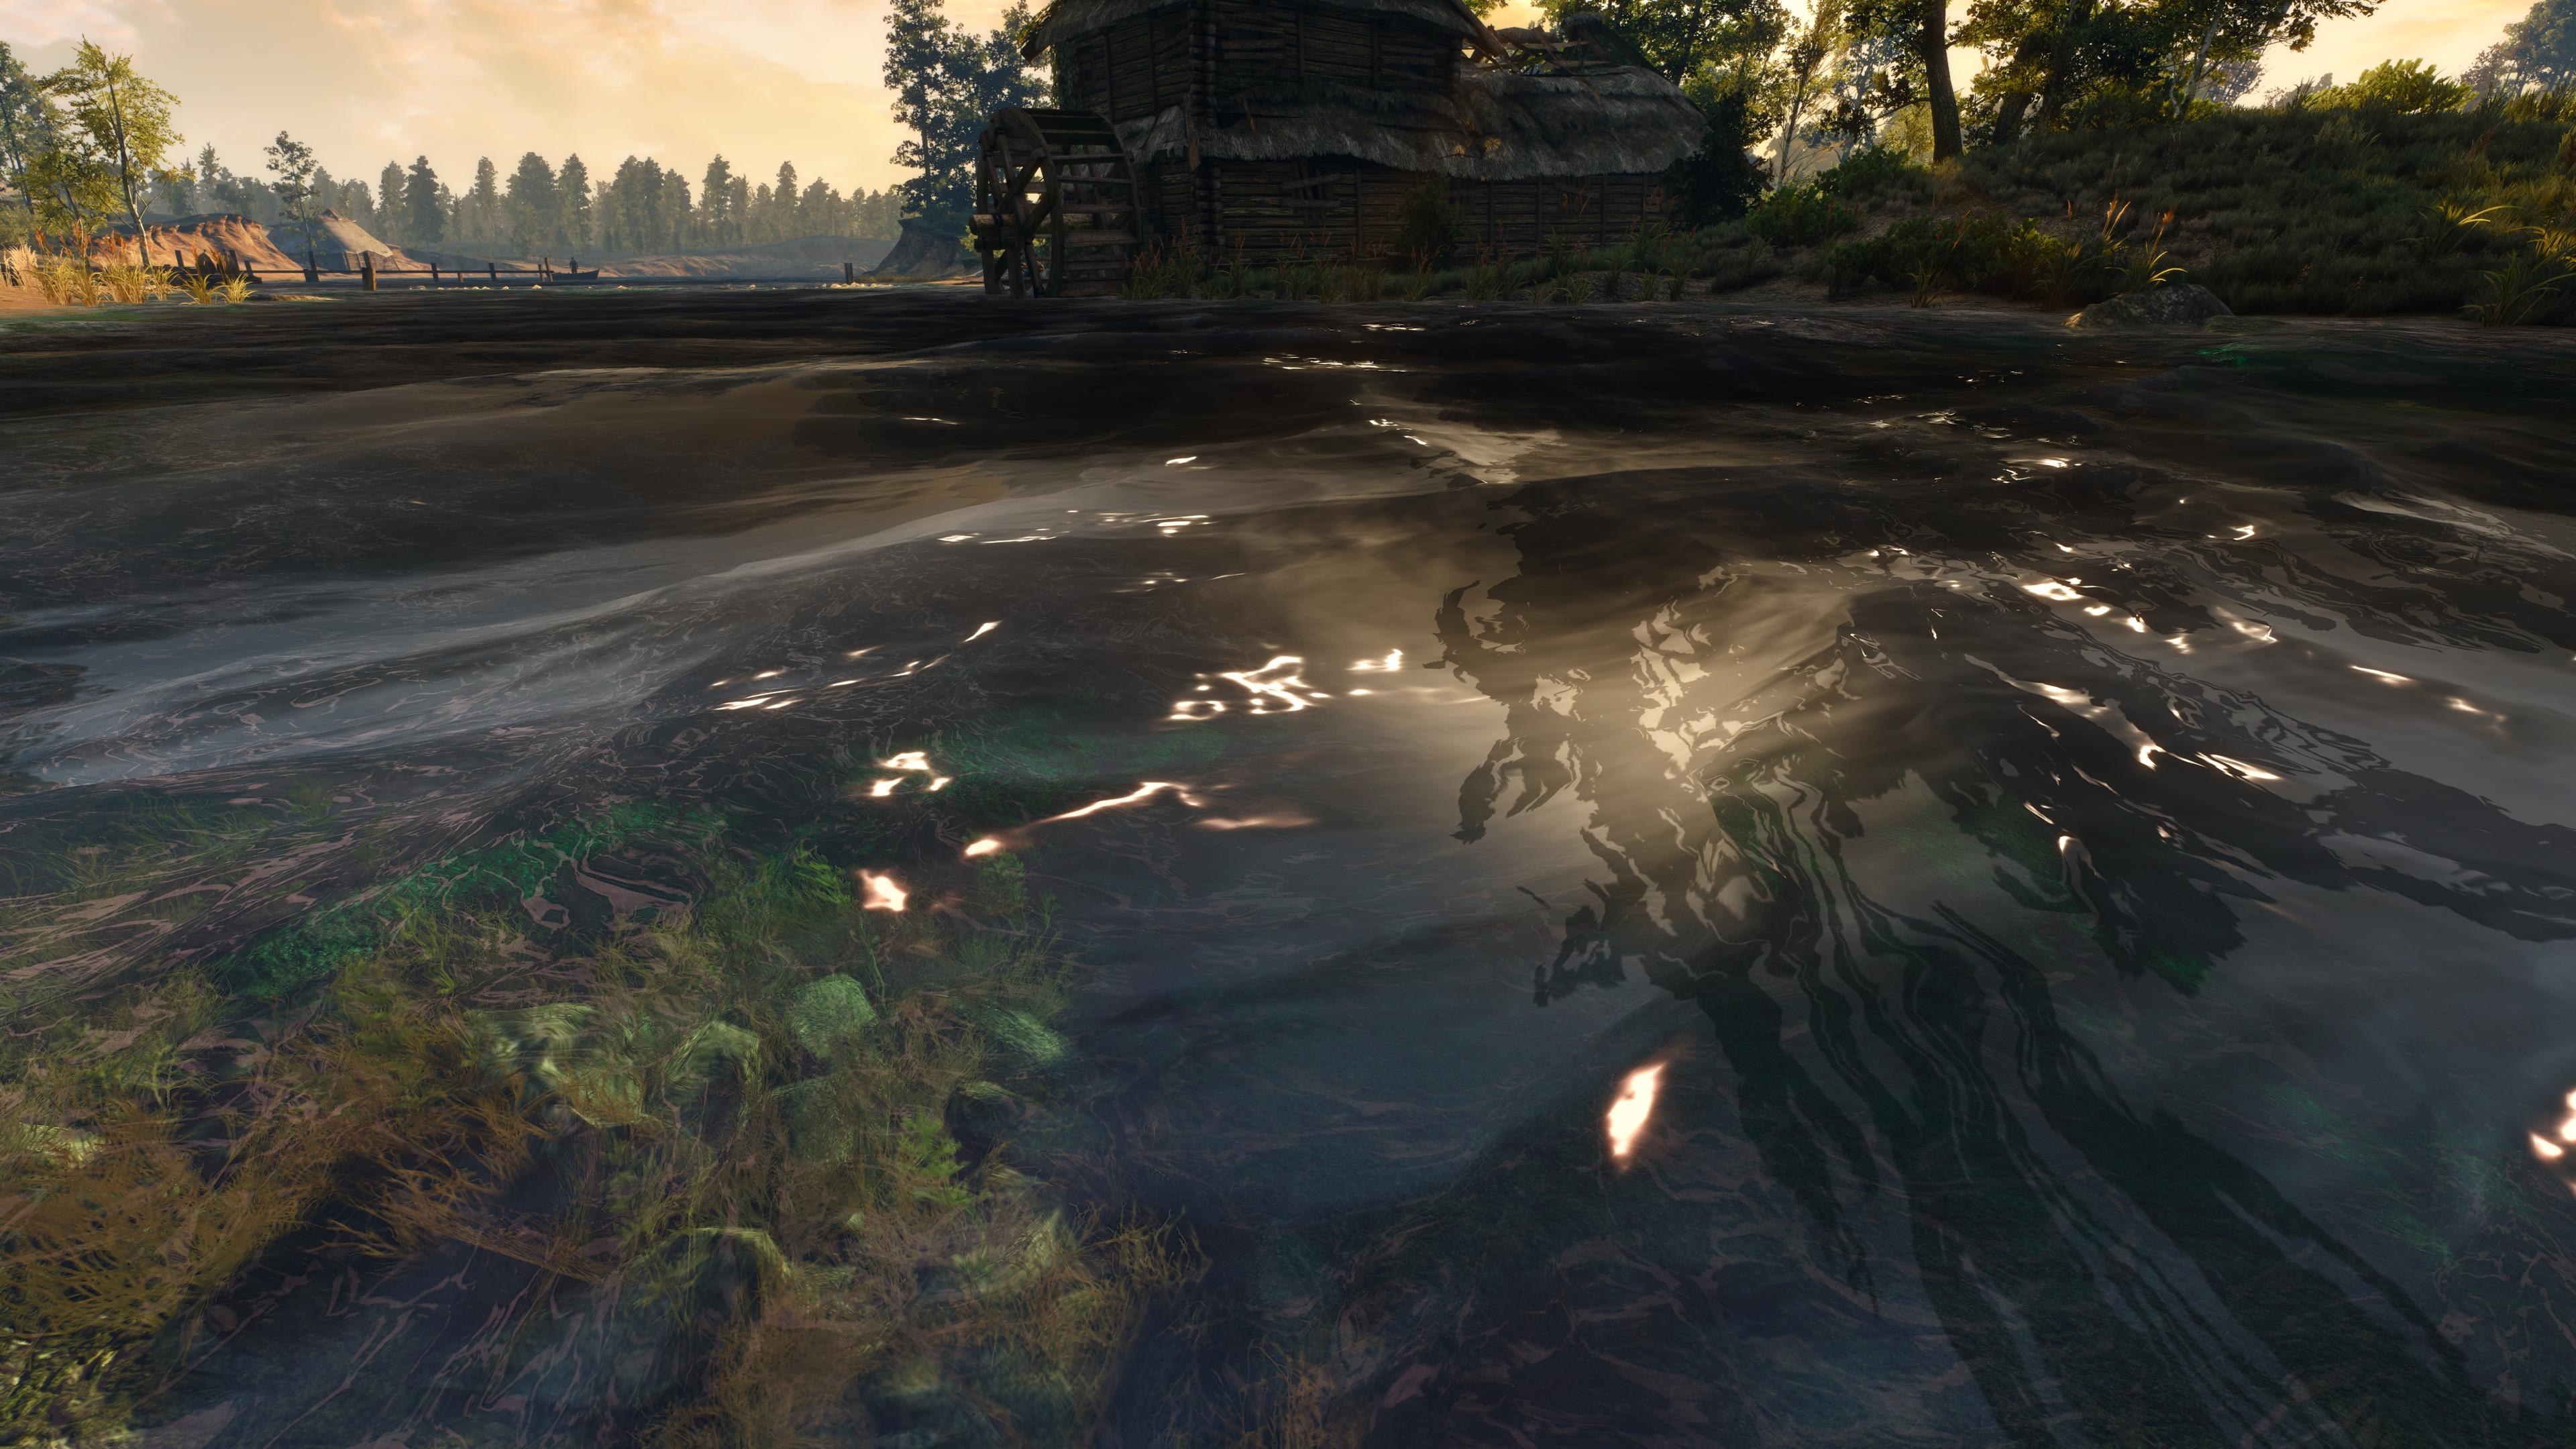 Ведьмак 3: Дикая охота скриншот с GeForce RTX 2080 - Witcher 3: Wild Hunt, the